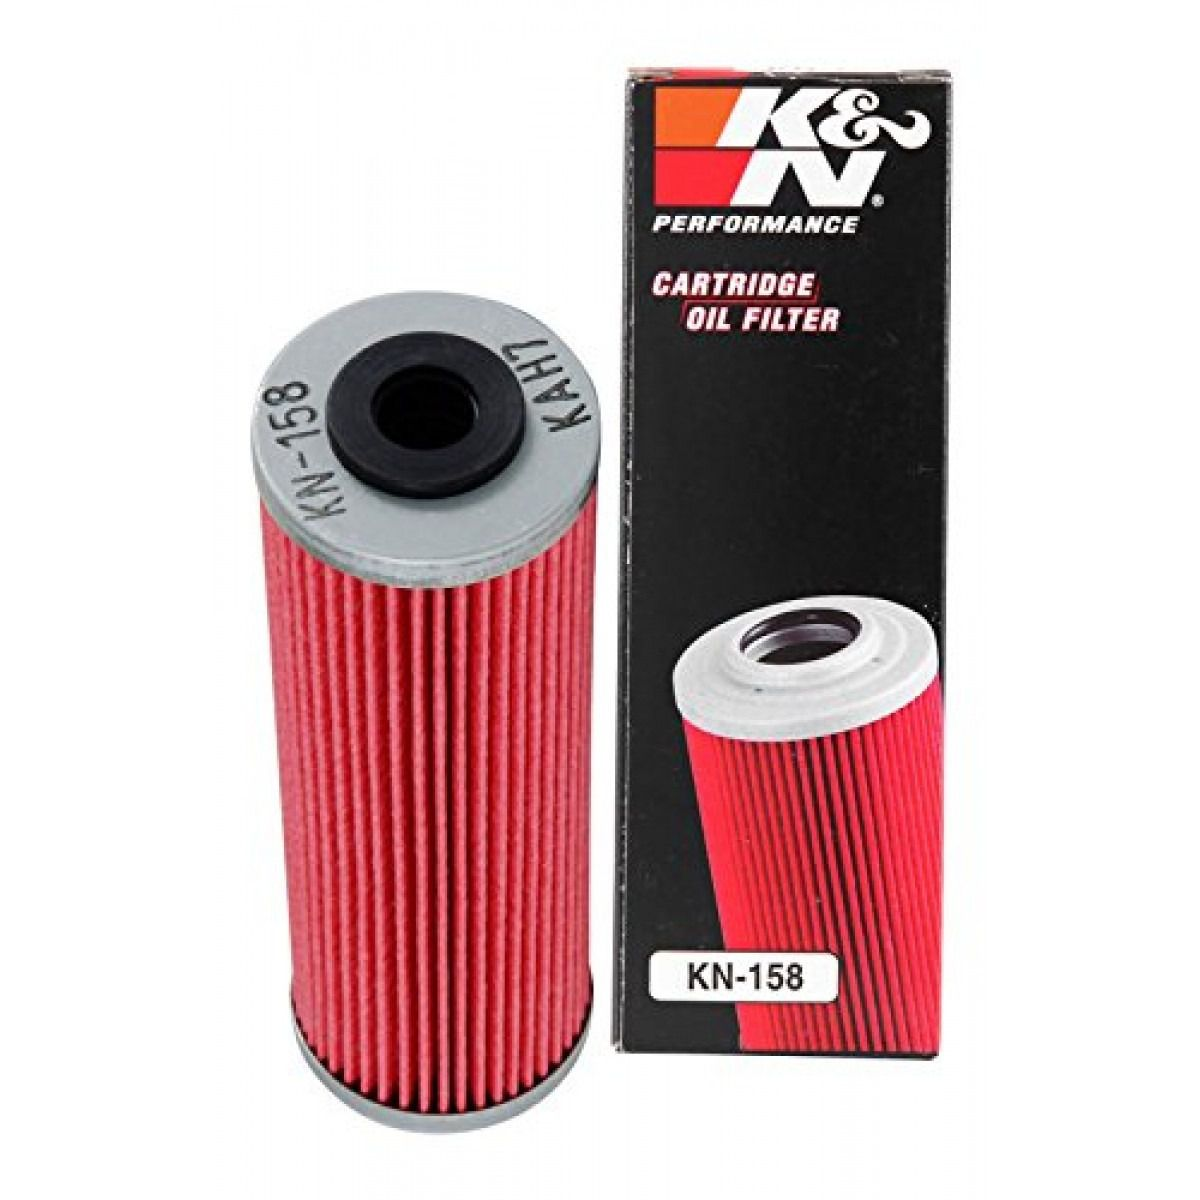 Filtro De Óleo  K&N KTM 950/990/1290 KN-158